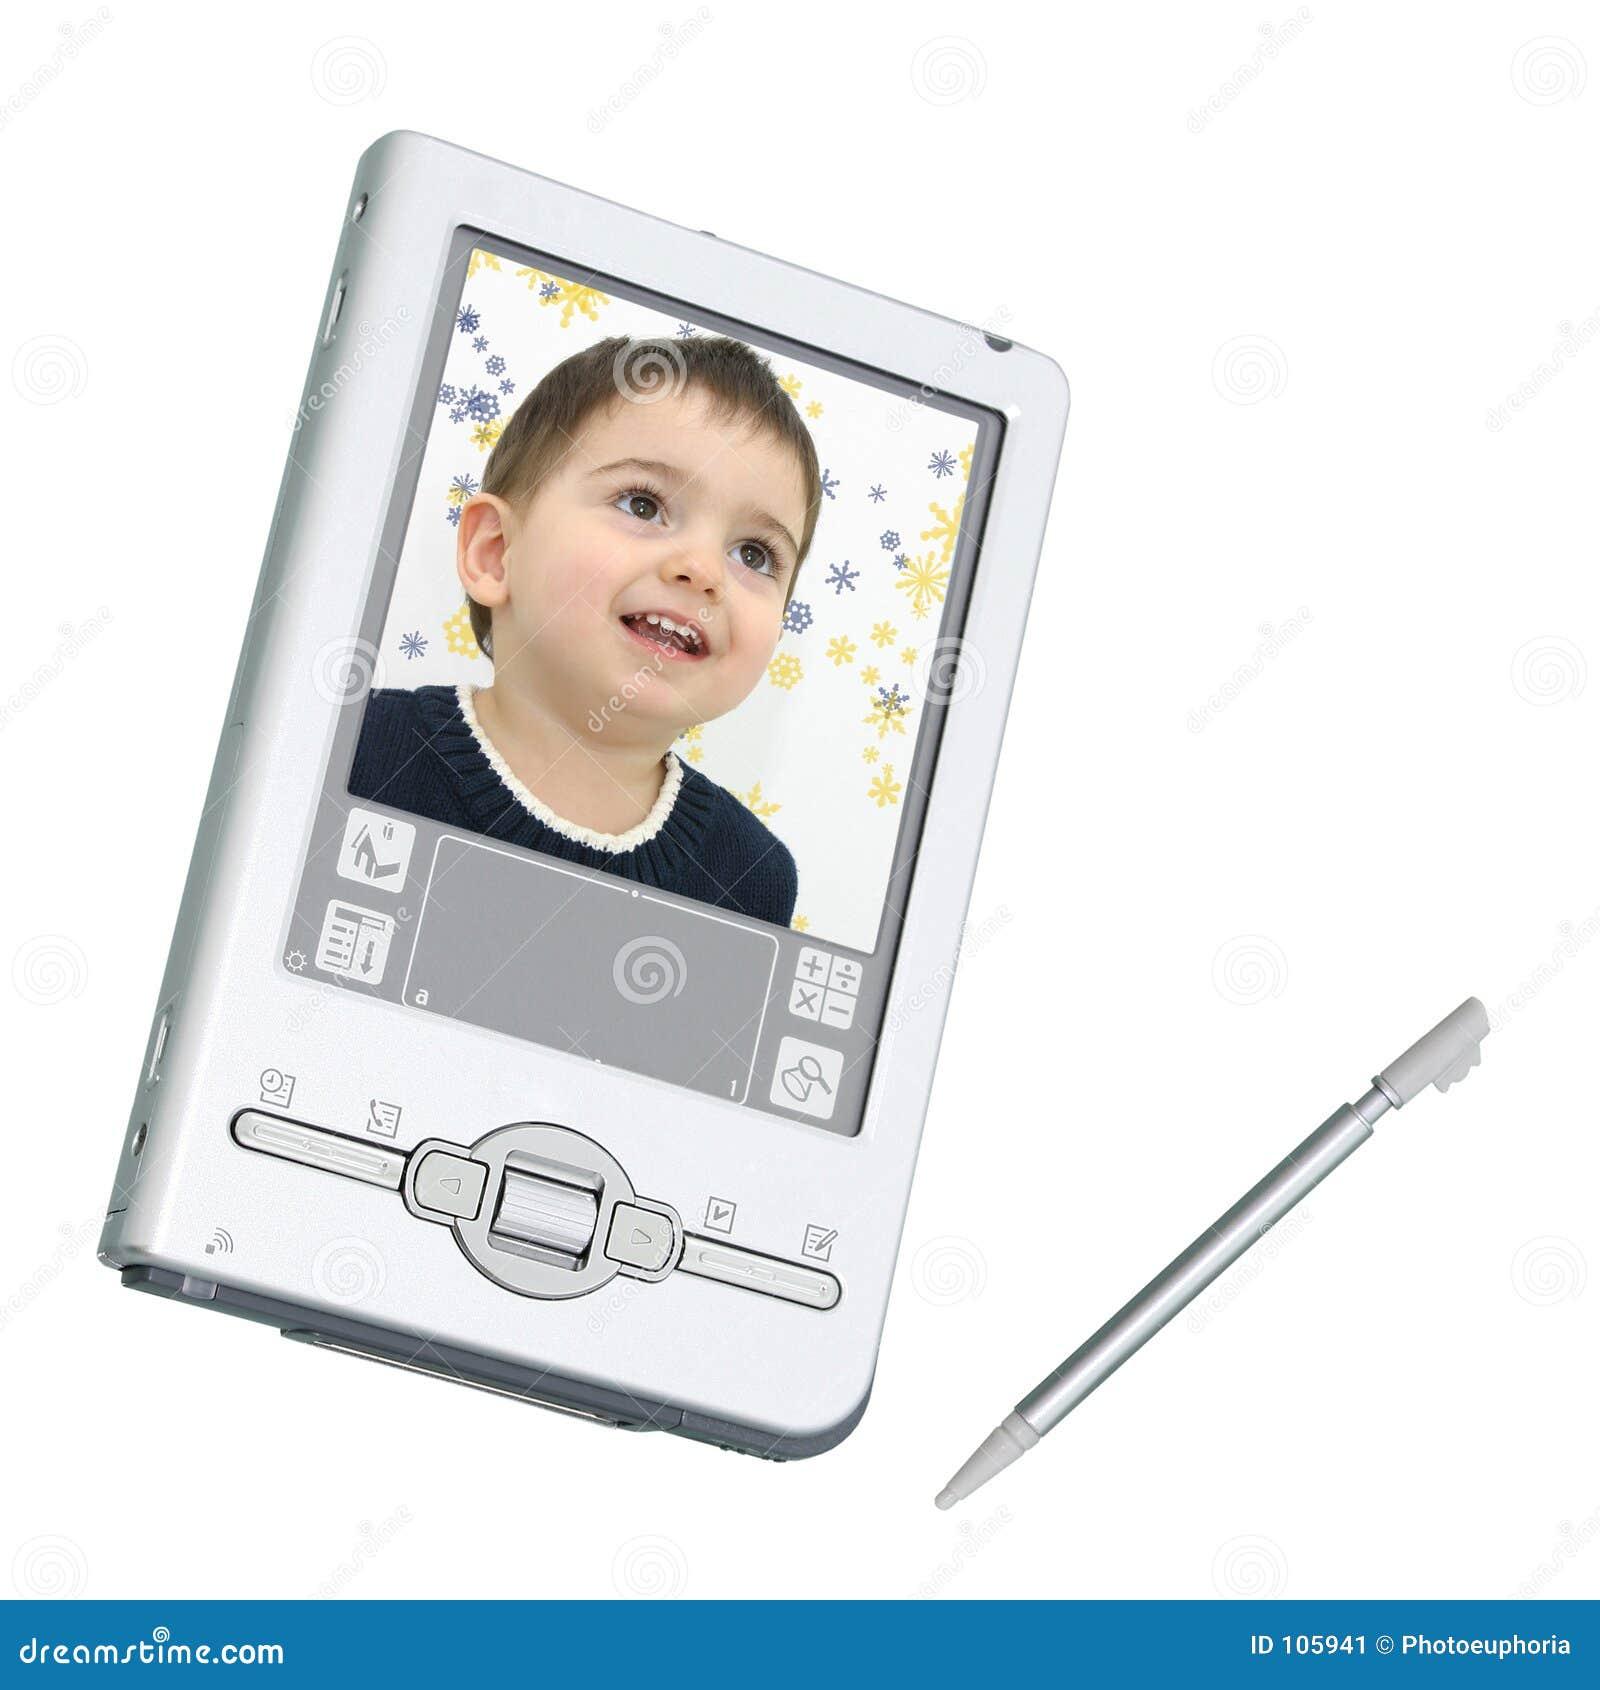 Digital PDA u. Stift über Weiß